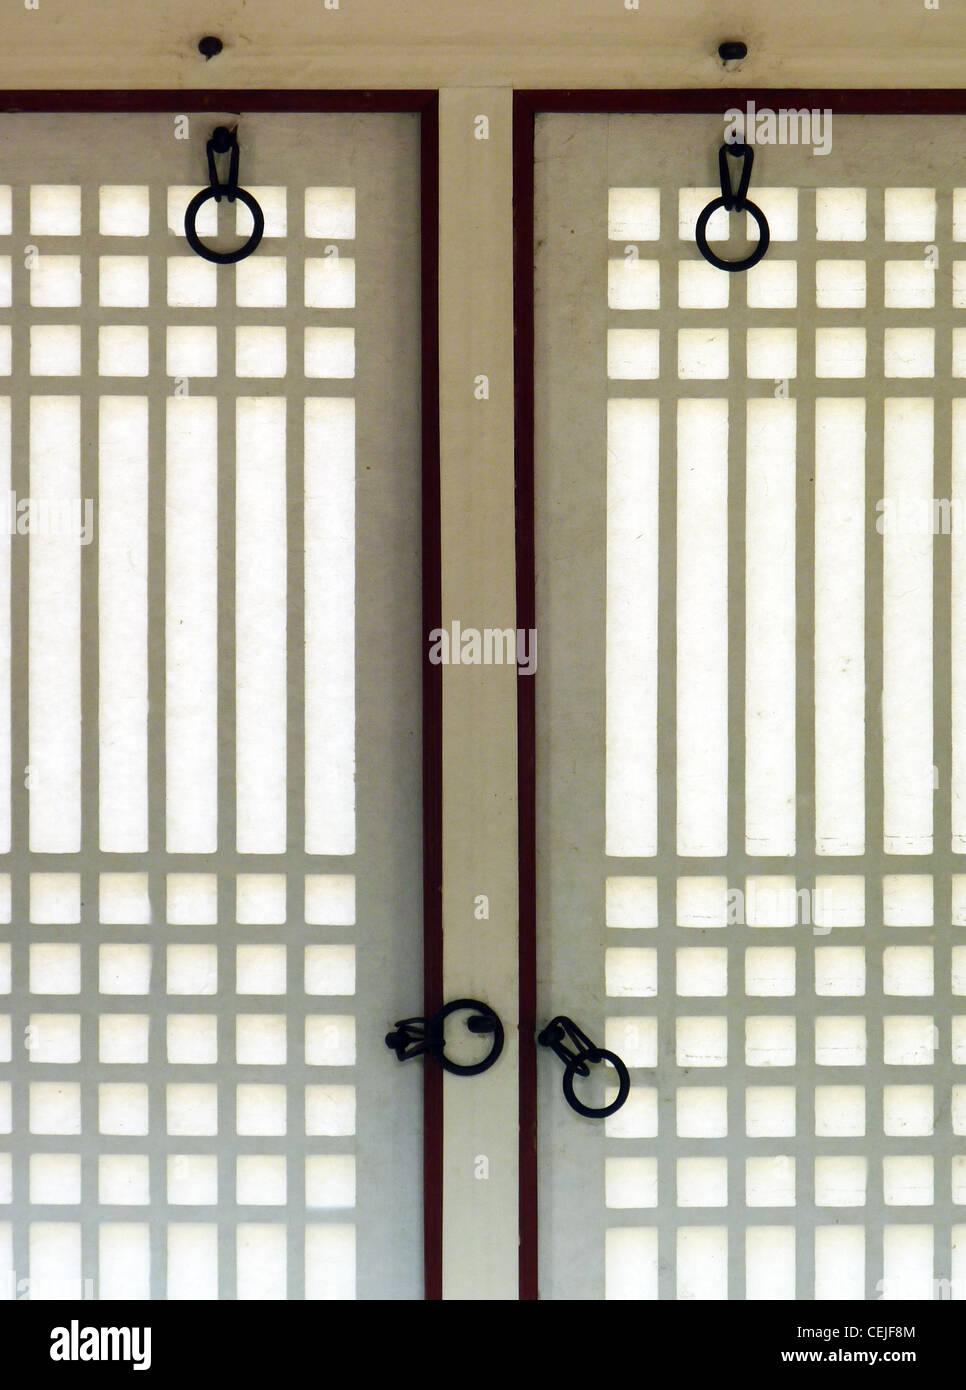 window detail of changdeok palace in seoul korea - Stock Image